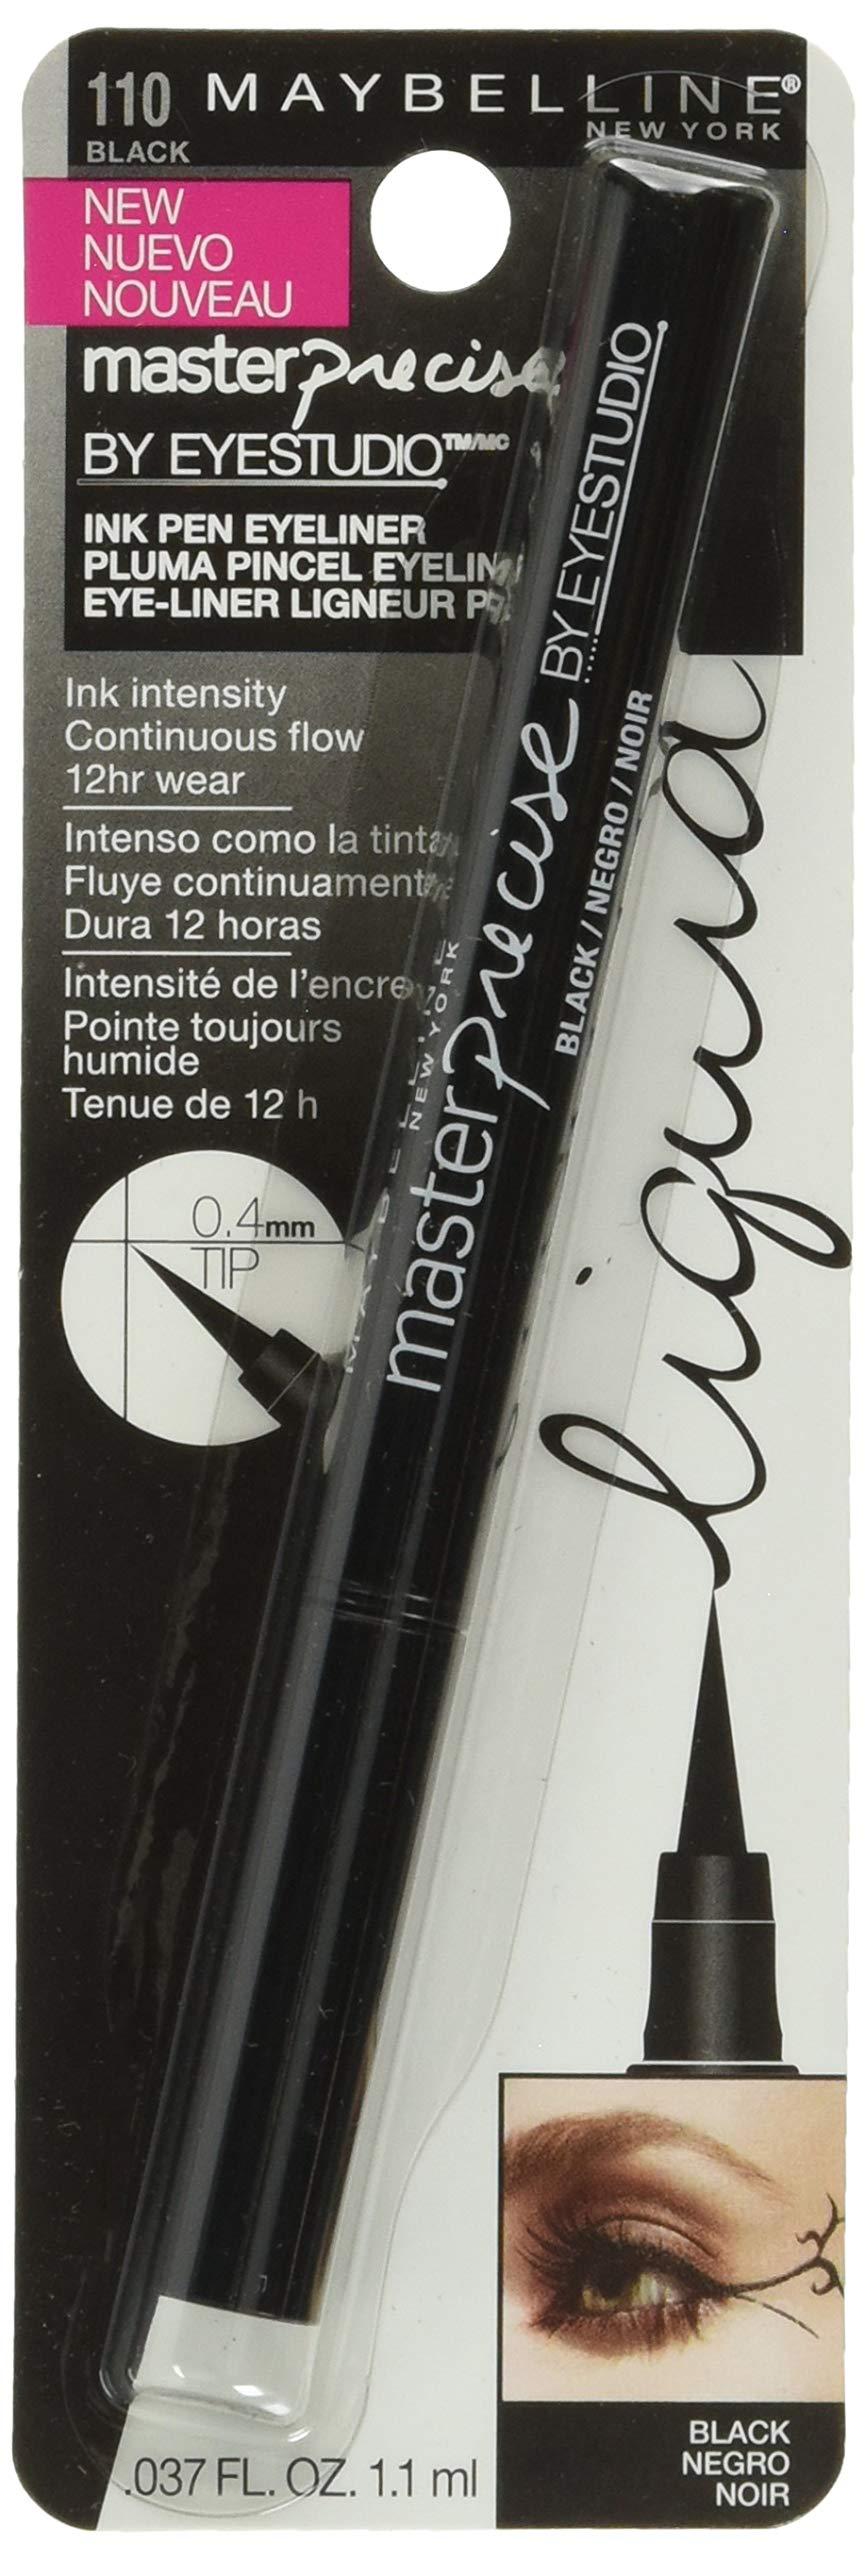 Maybelline Eyestudio Master Precise All Day Liquid Eyeliner Makeup, Black, 0.034 fl. oz.